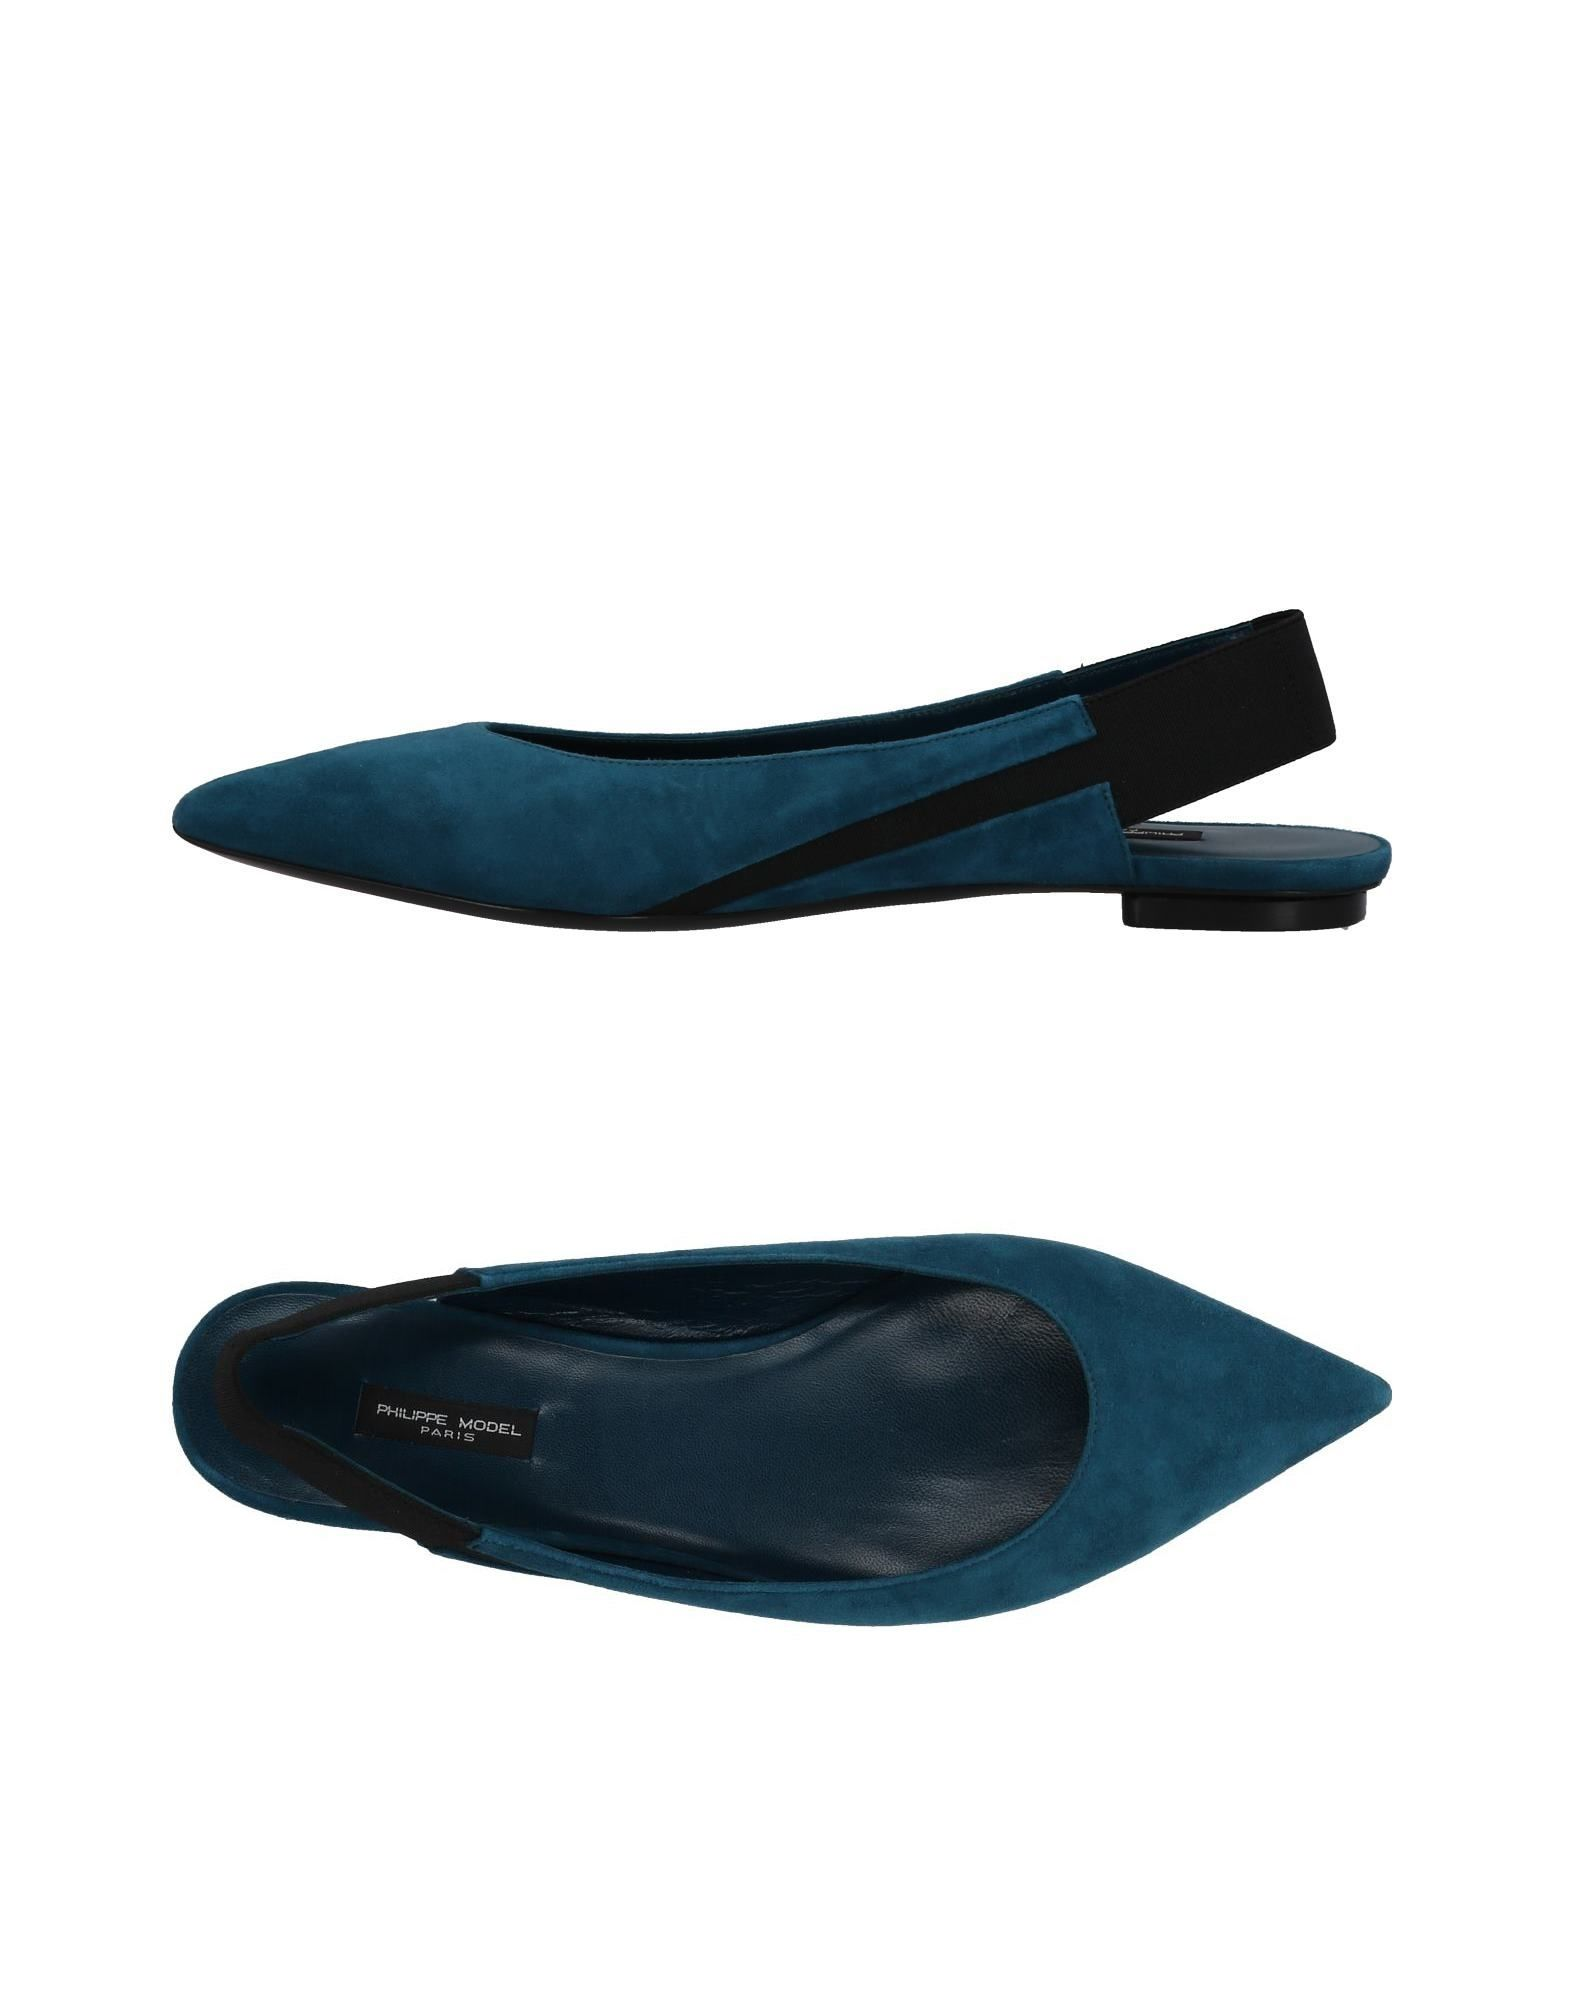 4f9e00f27 Philippe Model Ballet Flats - Women Philippe Model Ballet Flats Flats Flats  online on United Kingdom - 11433940OW 1a5132